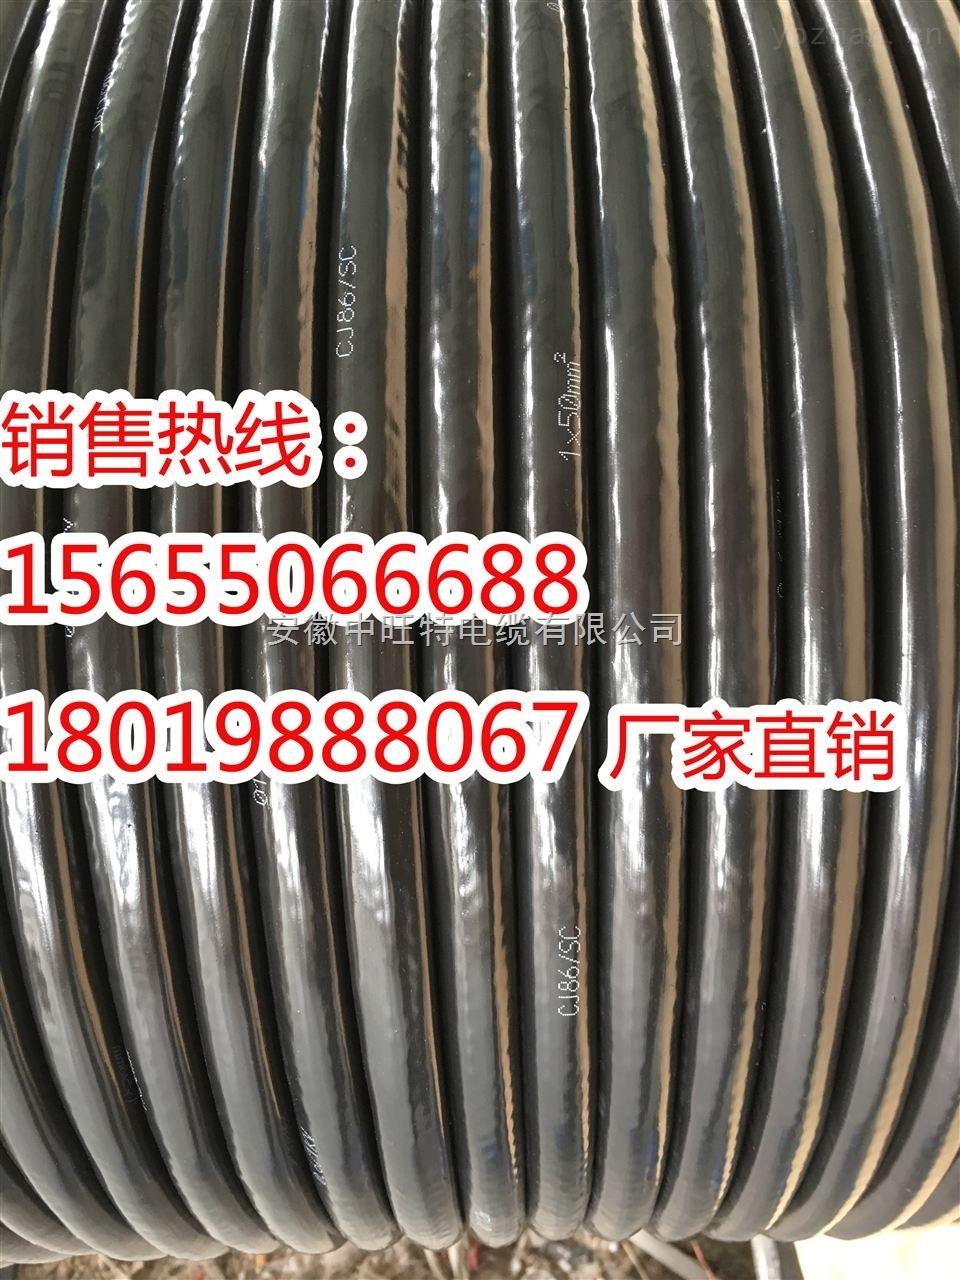 CJ86/SC船用电缆价格,CJ85/SC电缆供应商